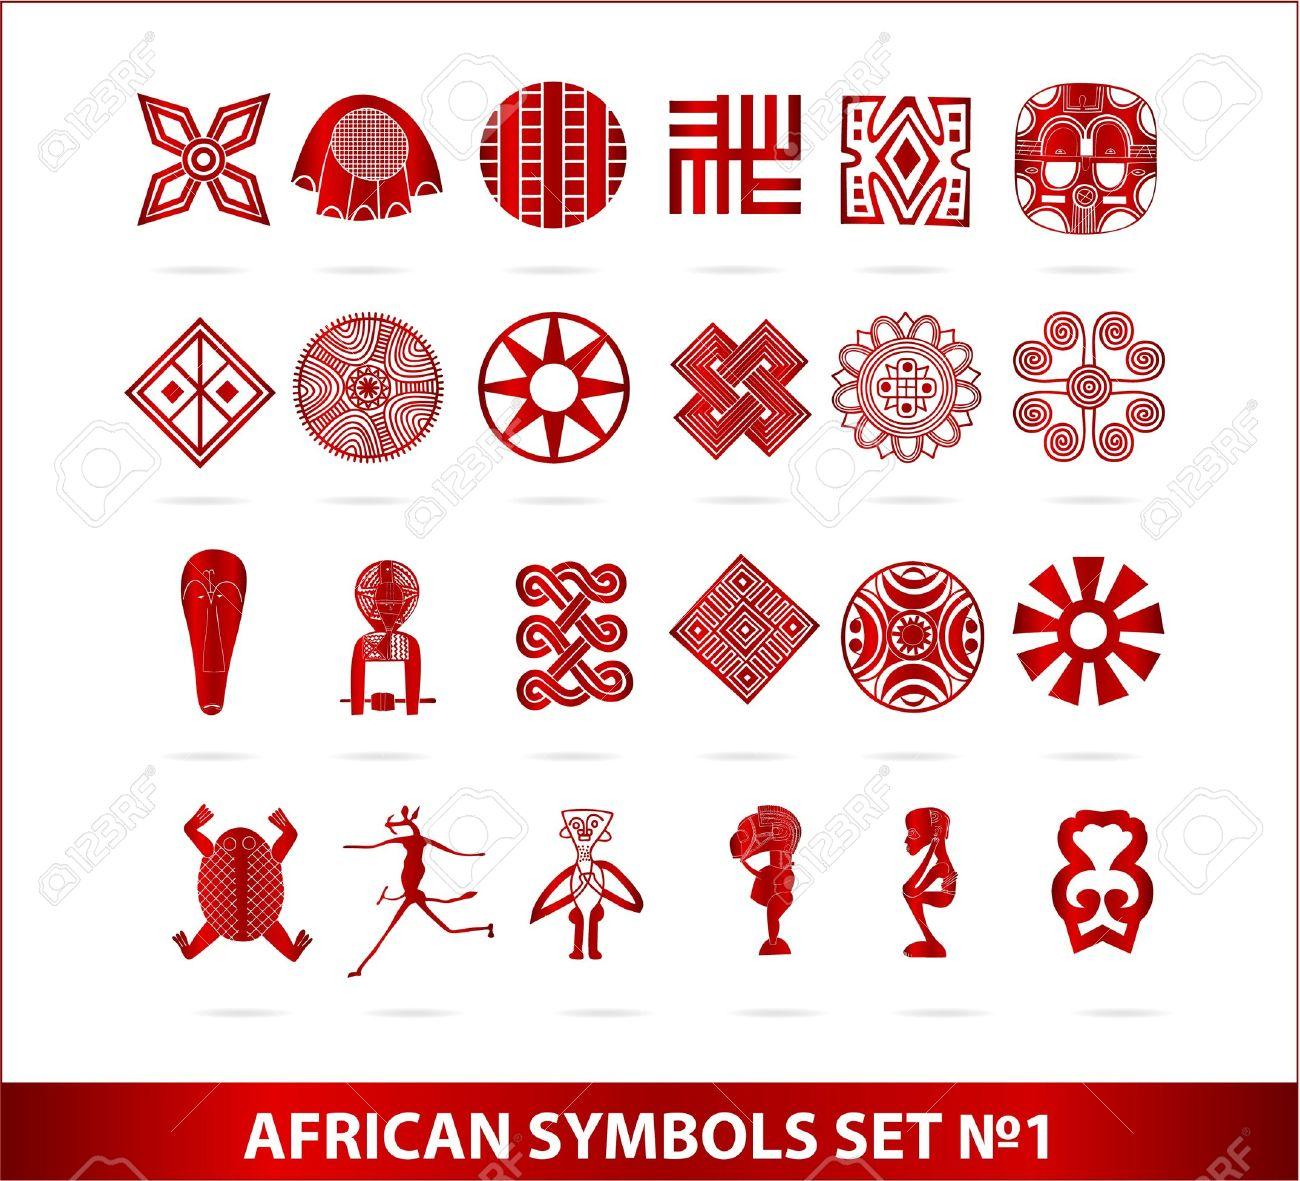 African Symbol Of Love